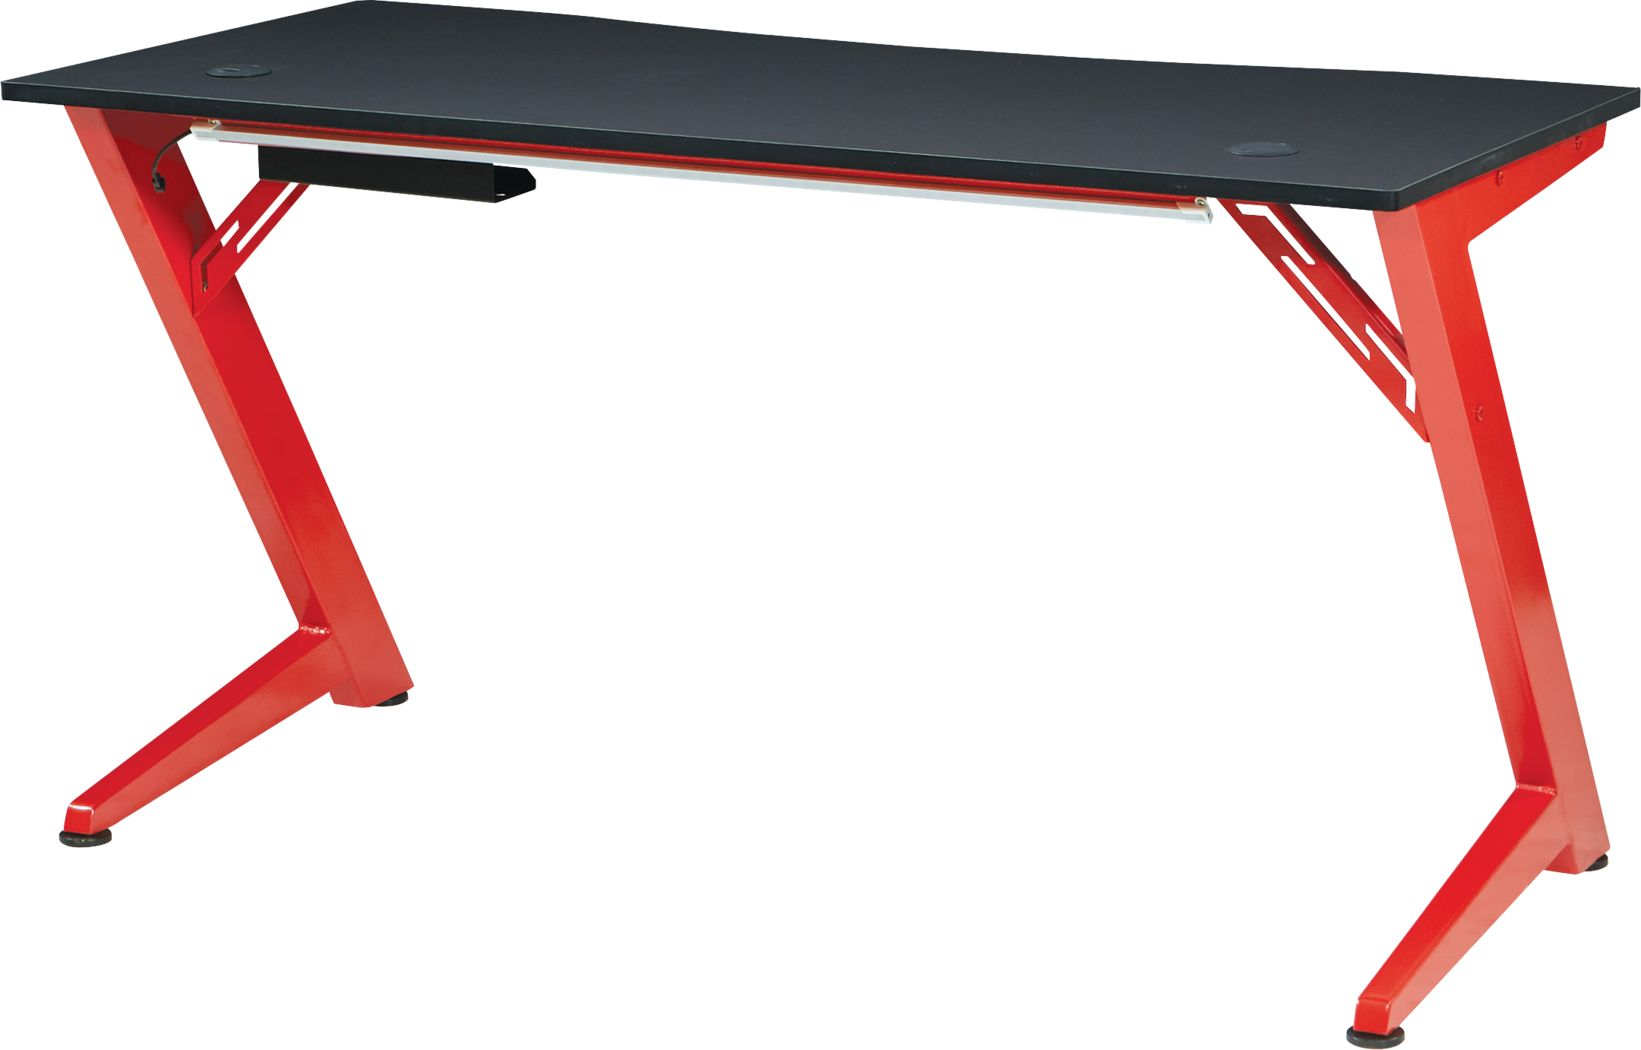 Taraia Red Gaming Desk